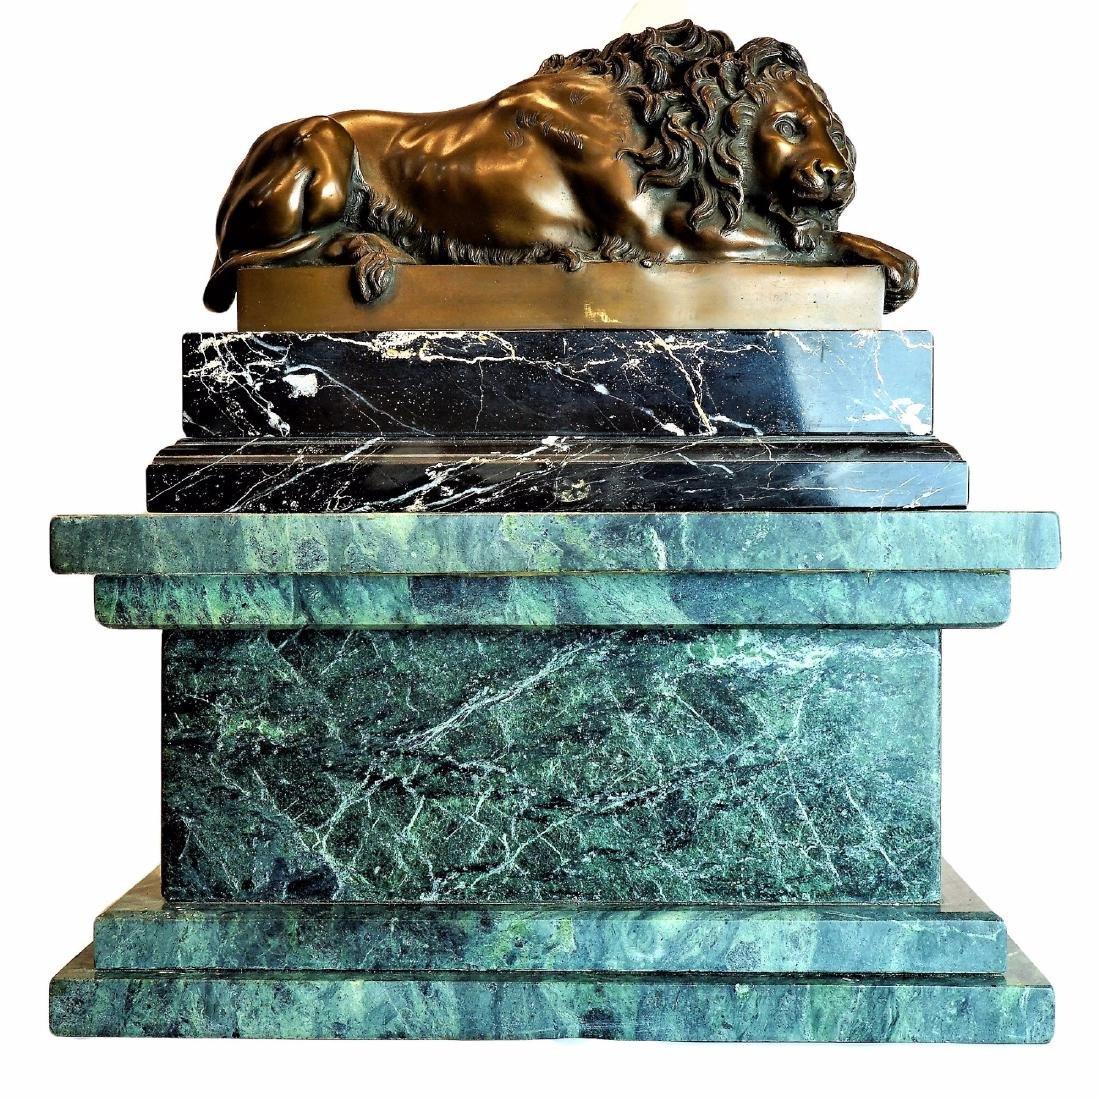 Bronze Lion Statue on Large Marble Plinth